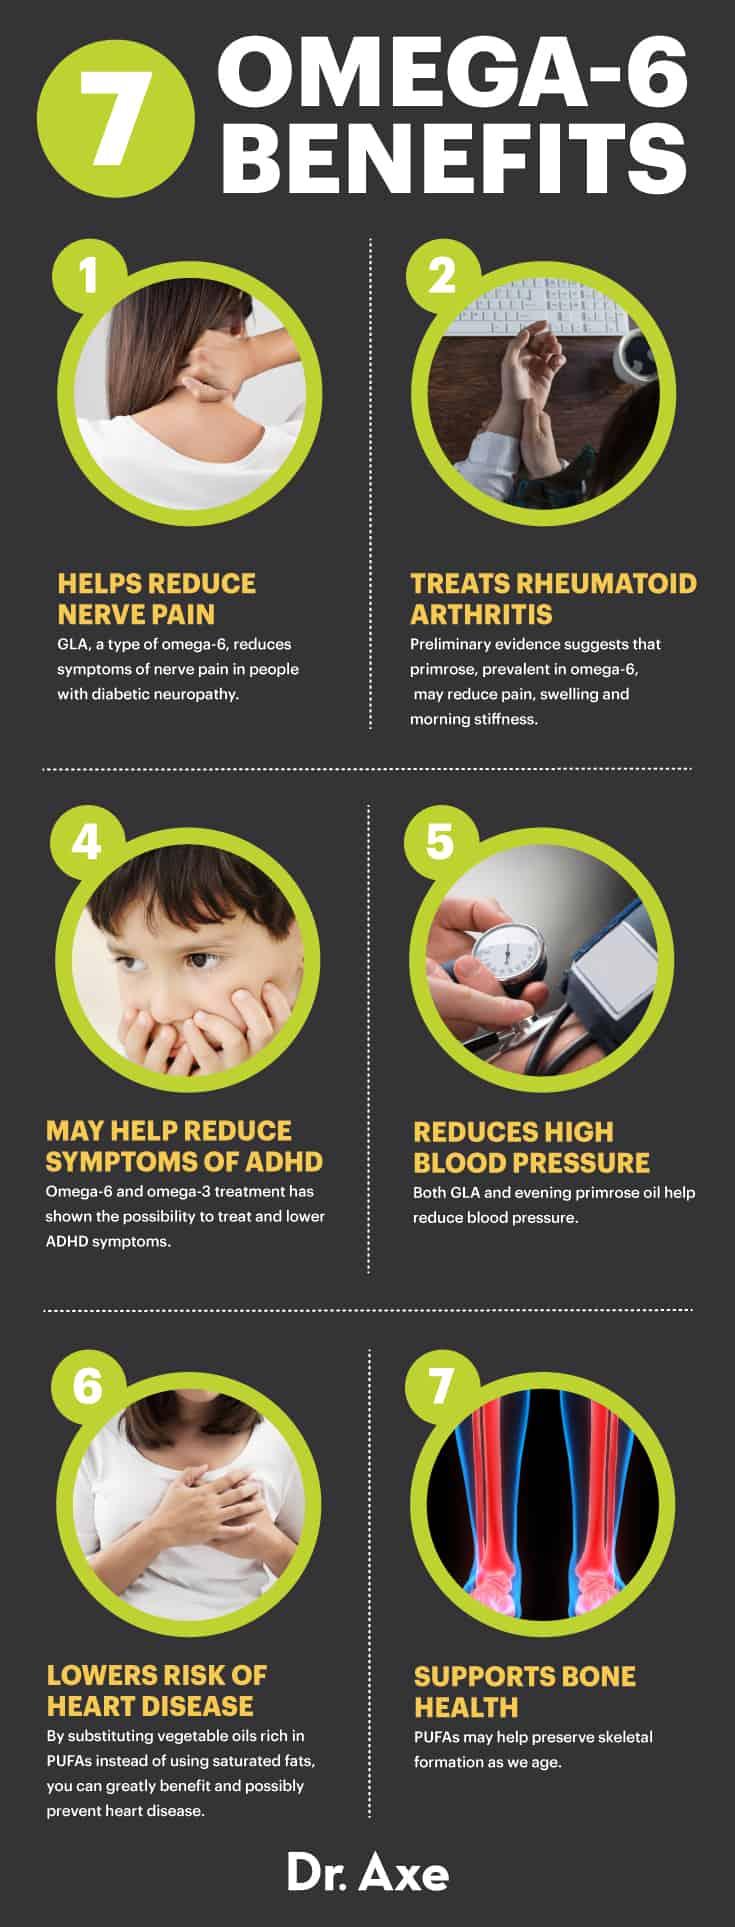 Omega 6 benefits - Dr. Axe